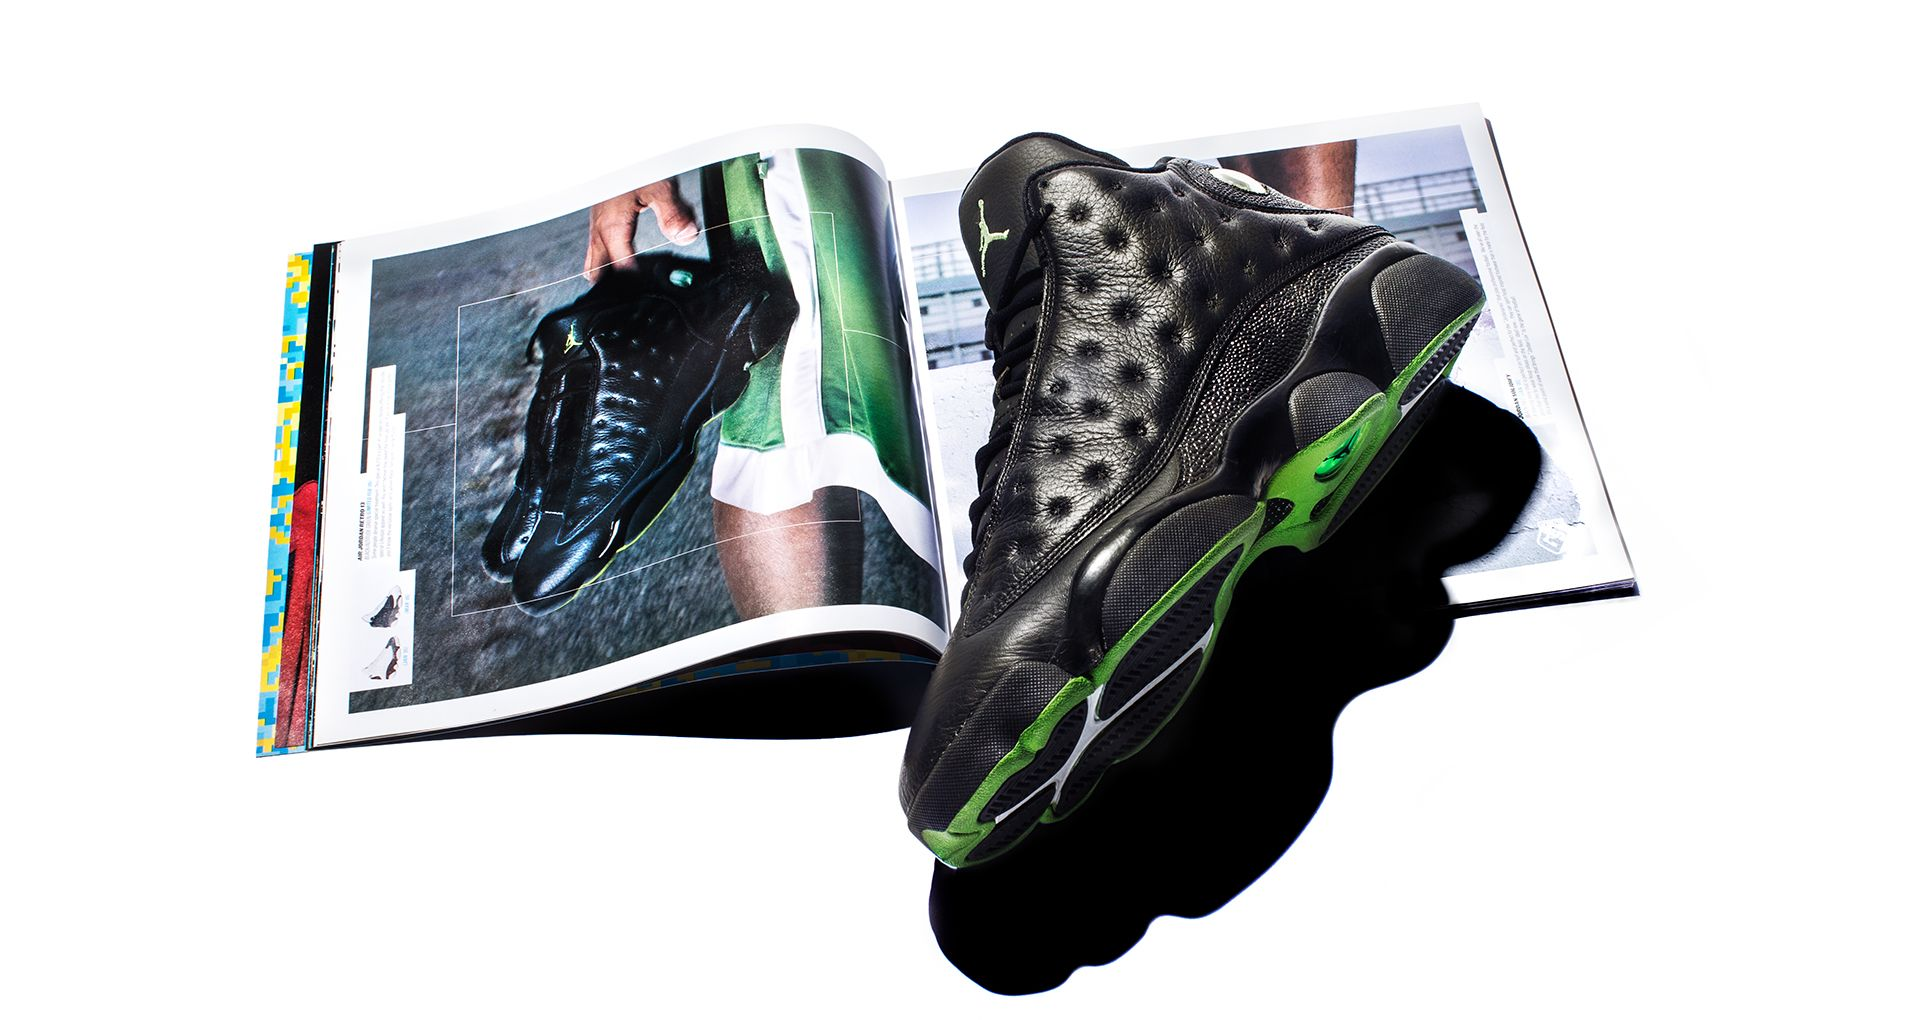 sale retailer 0dd0e 9d67f Inside The Vault: Air Jordan 13 Altitude Green. Nike+ SNKRS